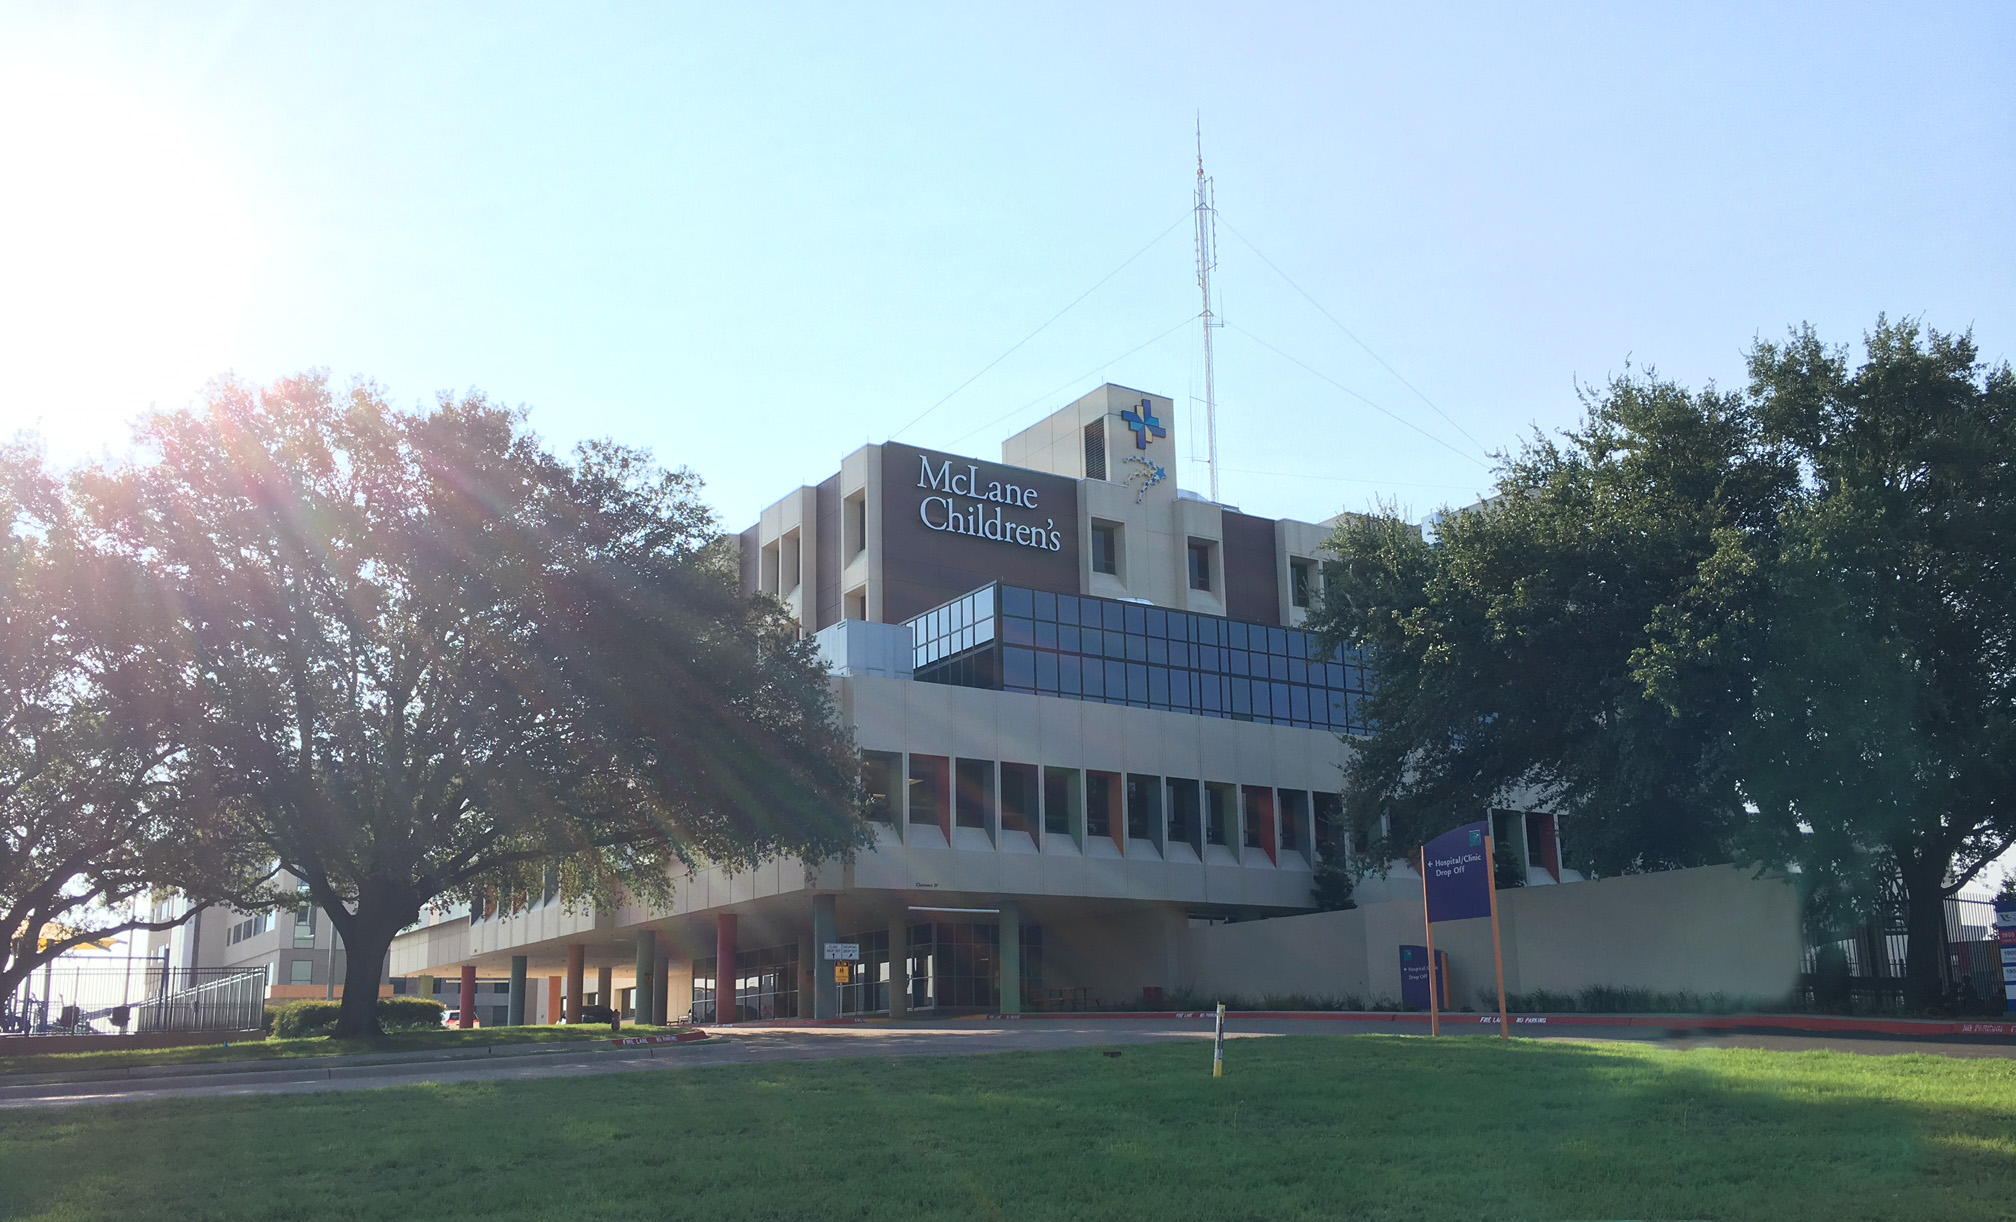 McLane Children's Hospital